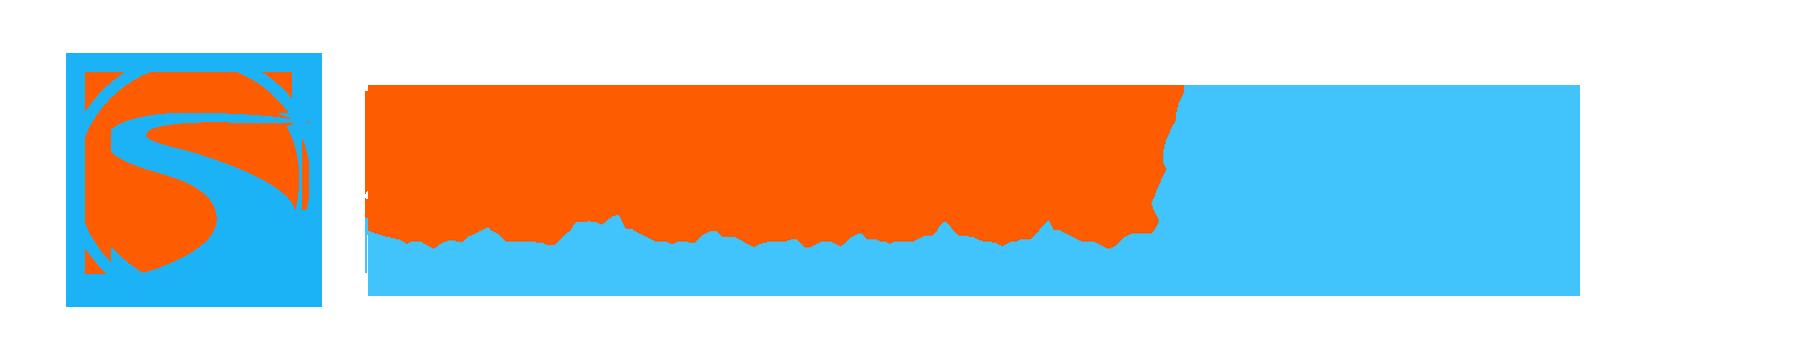 Sprint Set